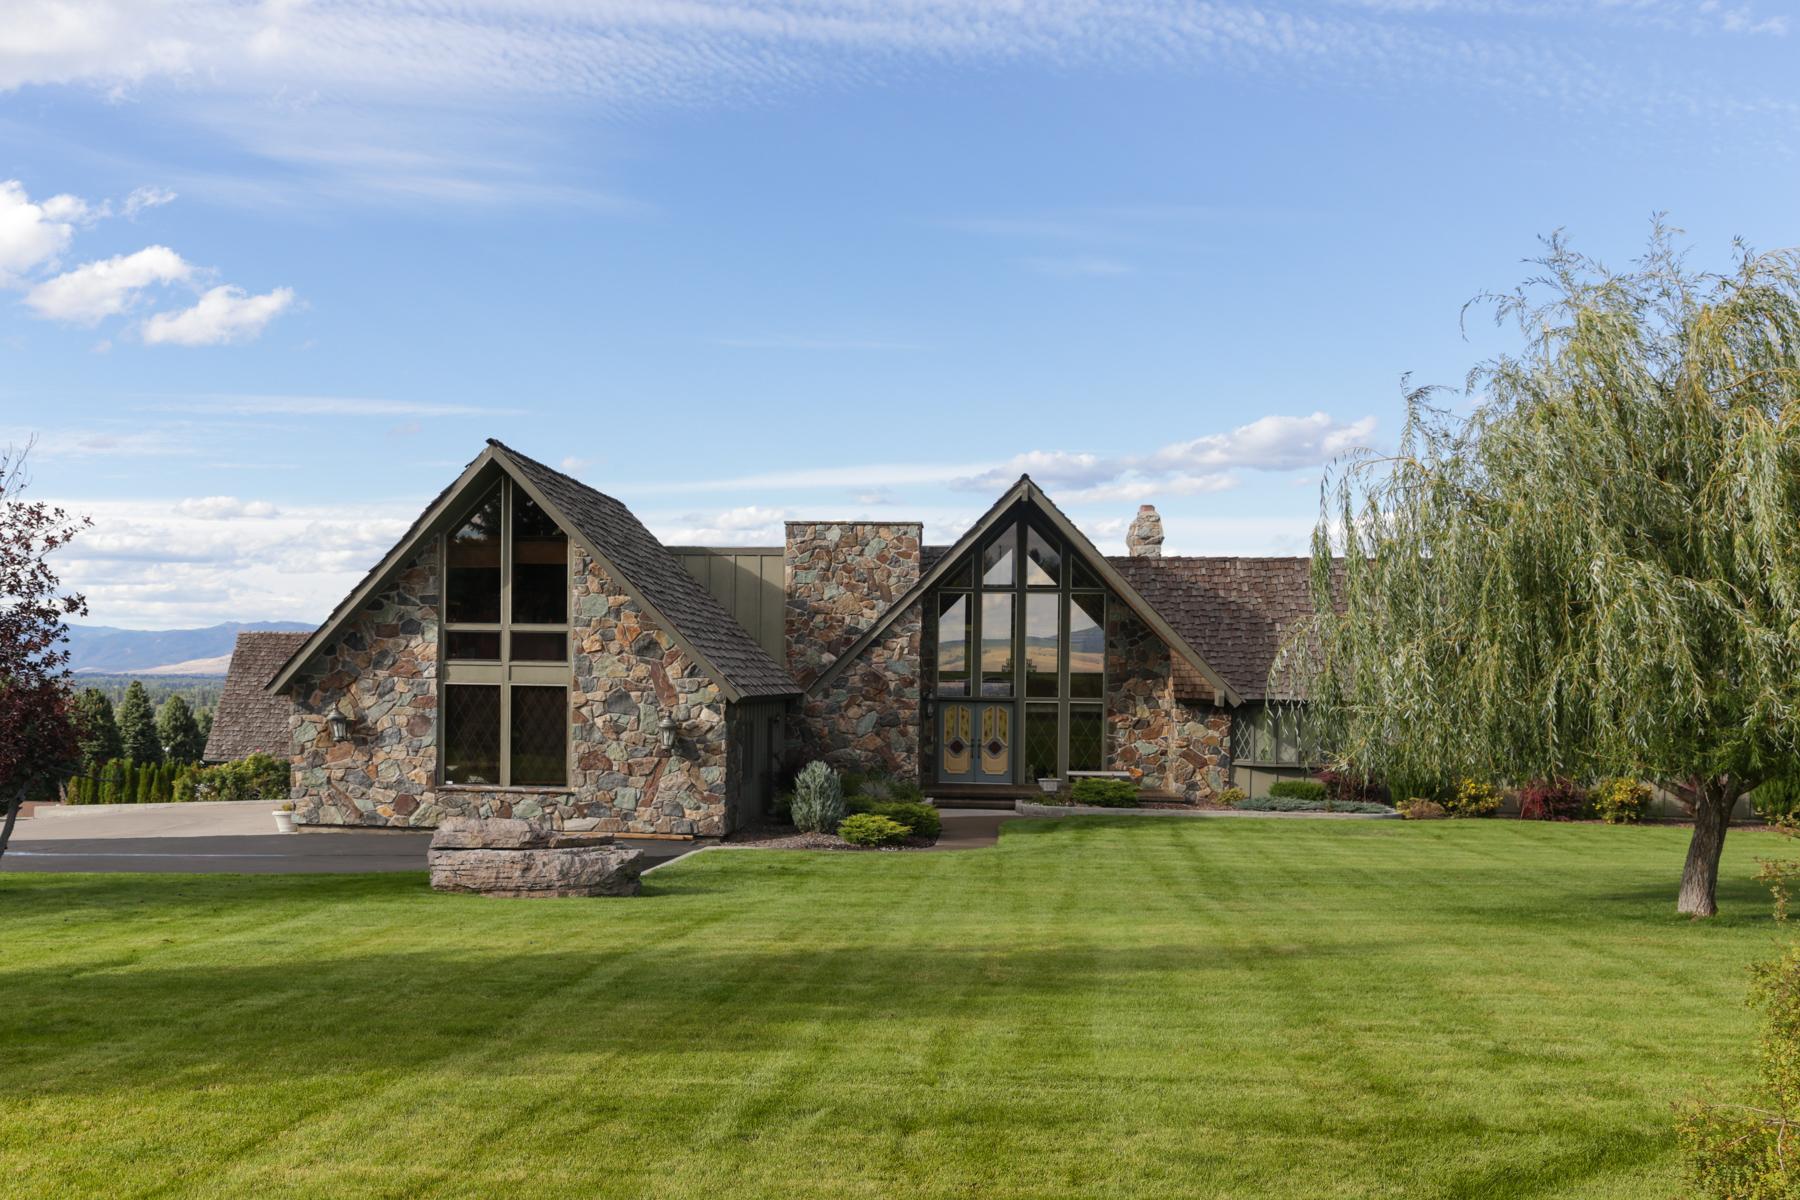 Casa Unifamiliar por un Venta en 2900 St. Michael 2900 St Michael Dr Missoula, Montana, 59803 Estados Unidos